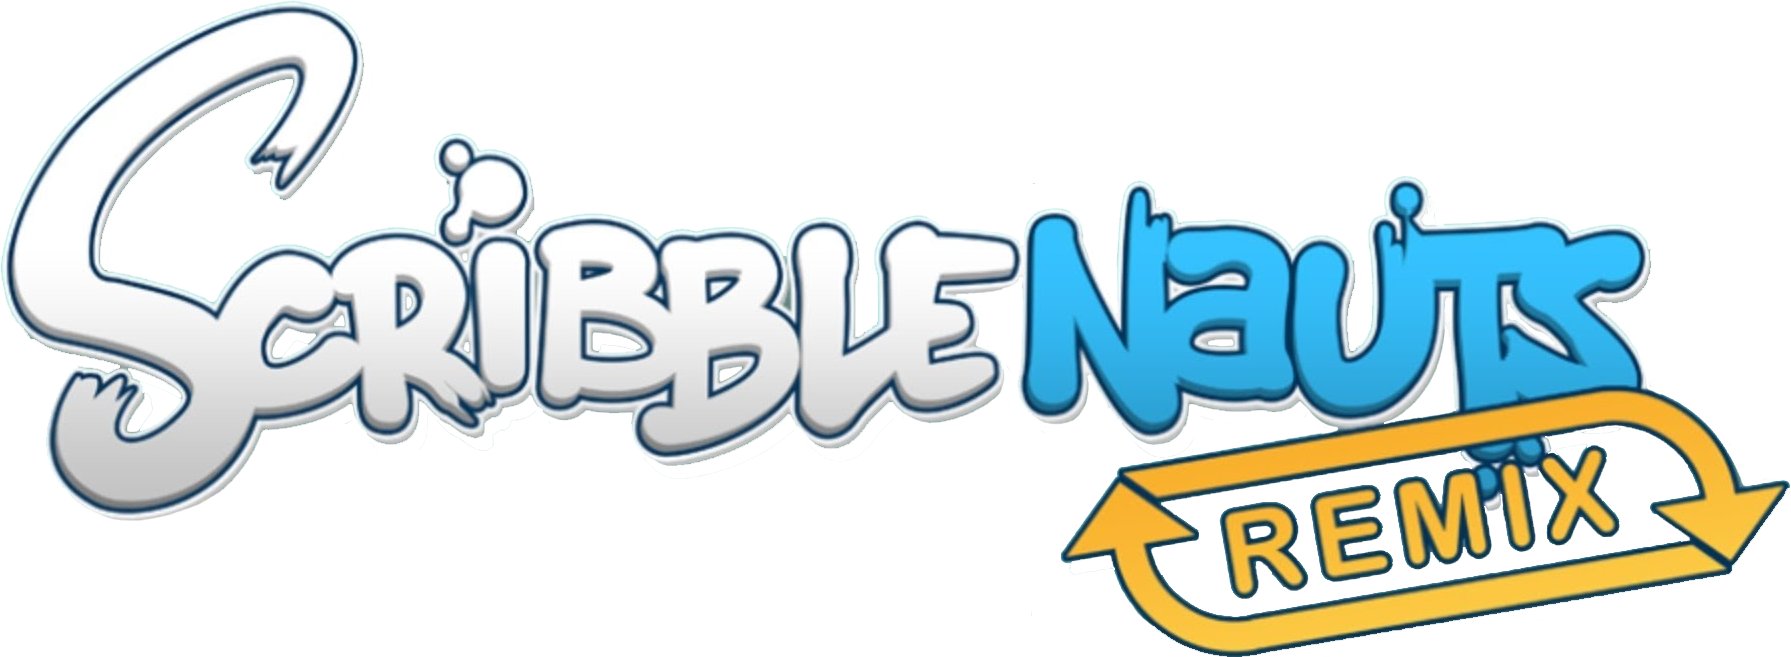 Scribblenauts Remix | Scribblenauts Wiki | FANDOM powered by